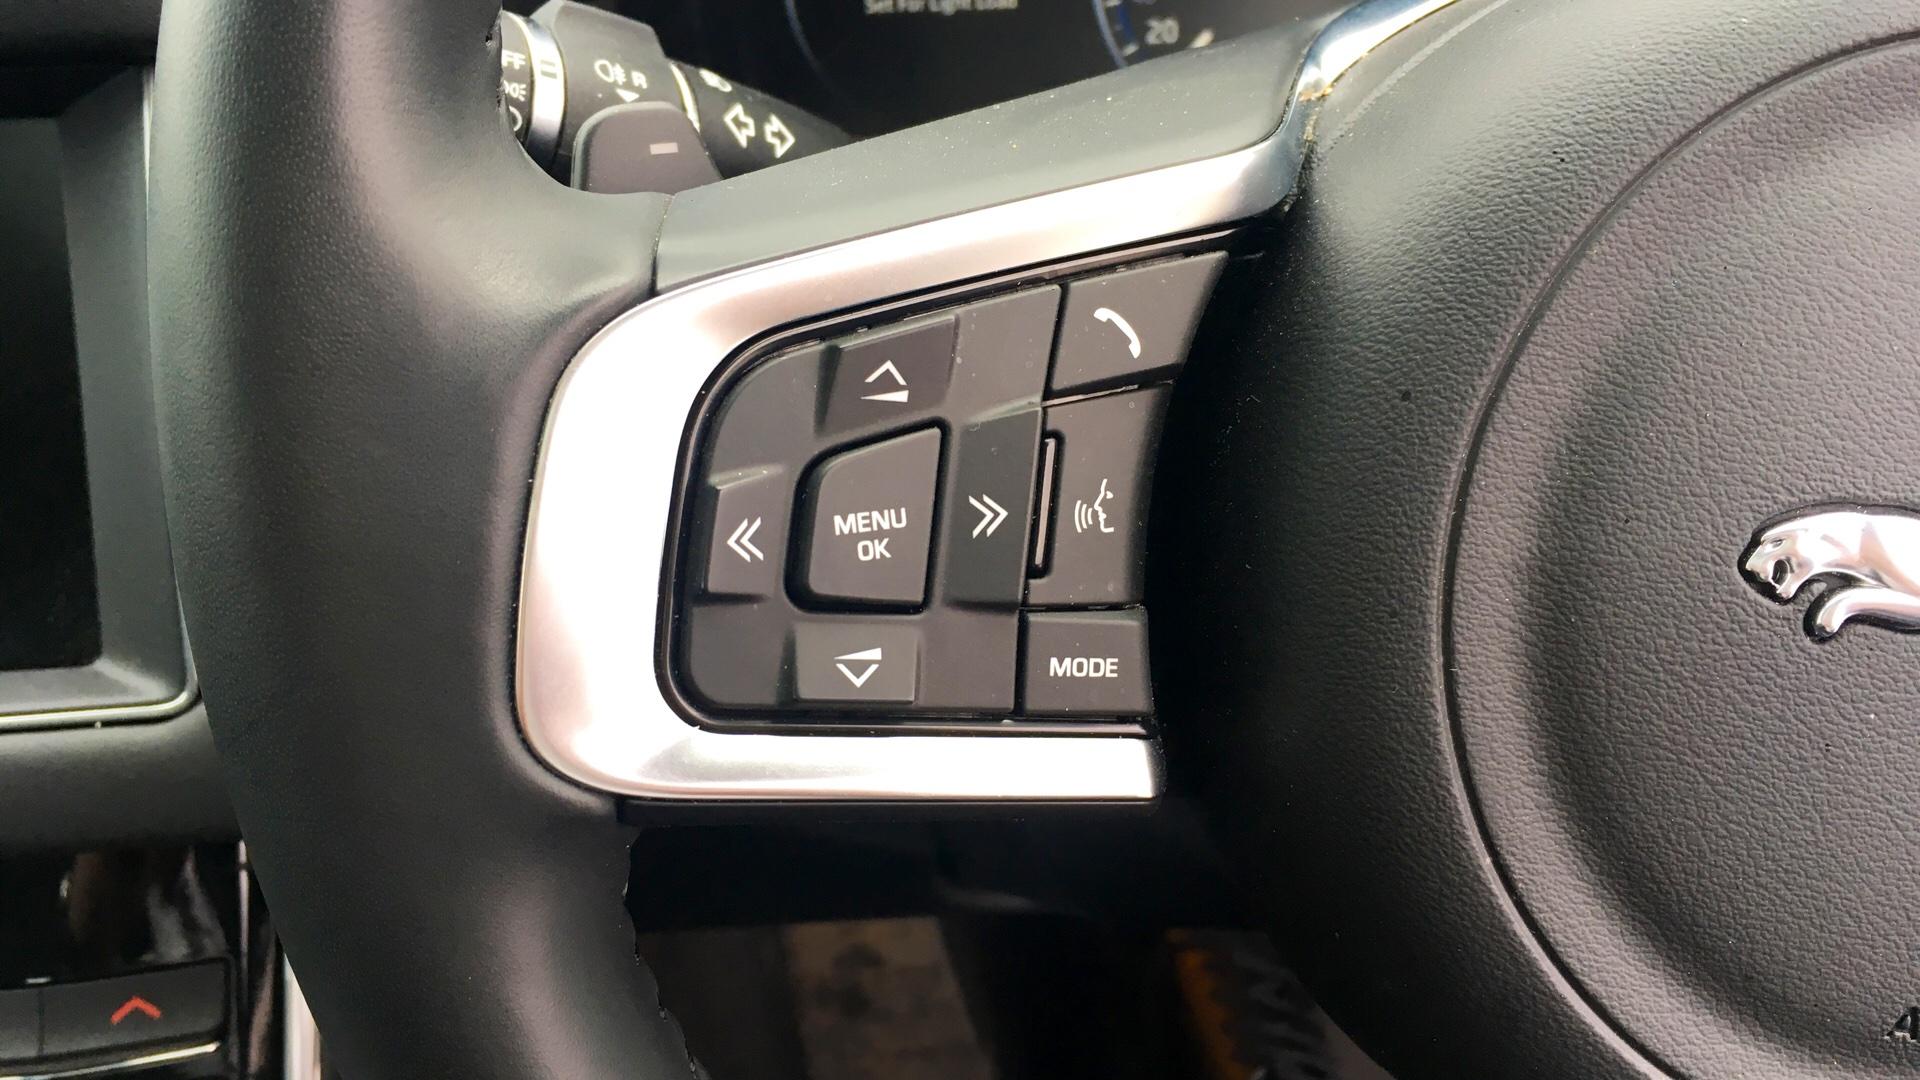 Used Jaguar XF 3 0D V6 Portfolio 4Dr Auto Diesel Saloon for Sale